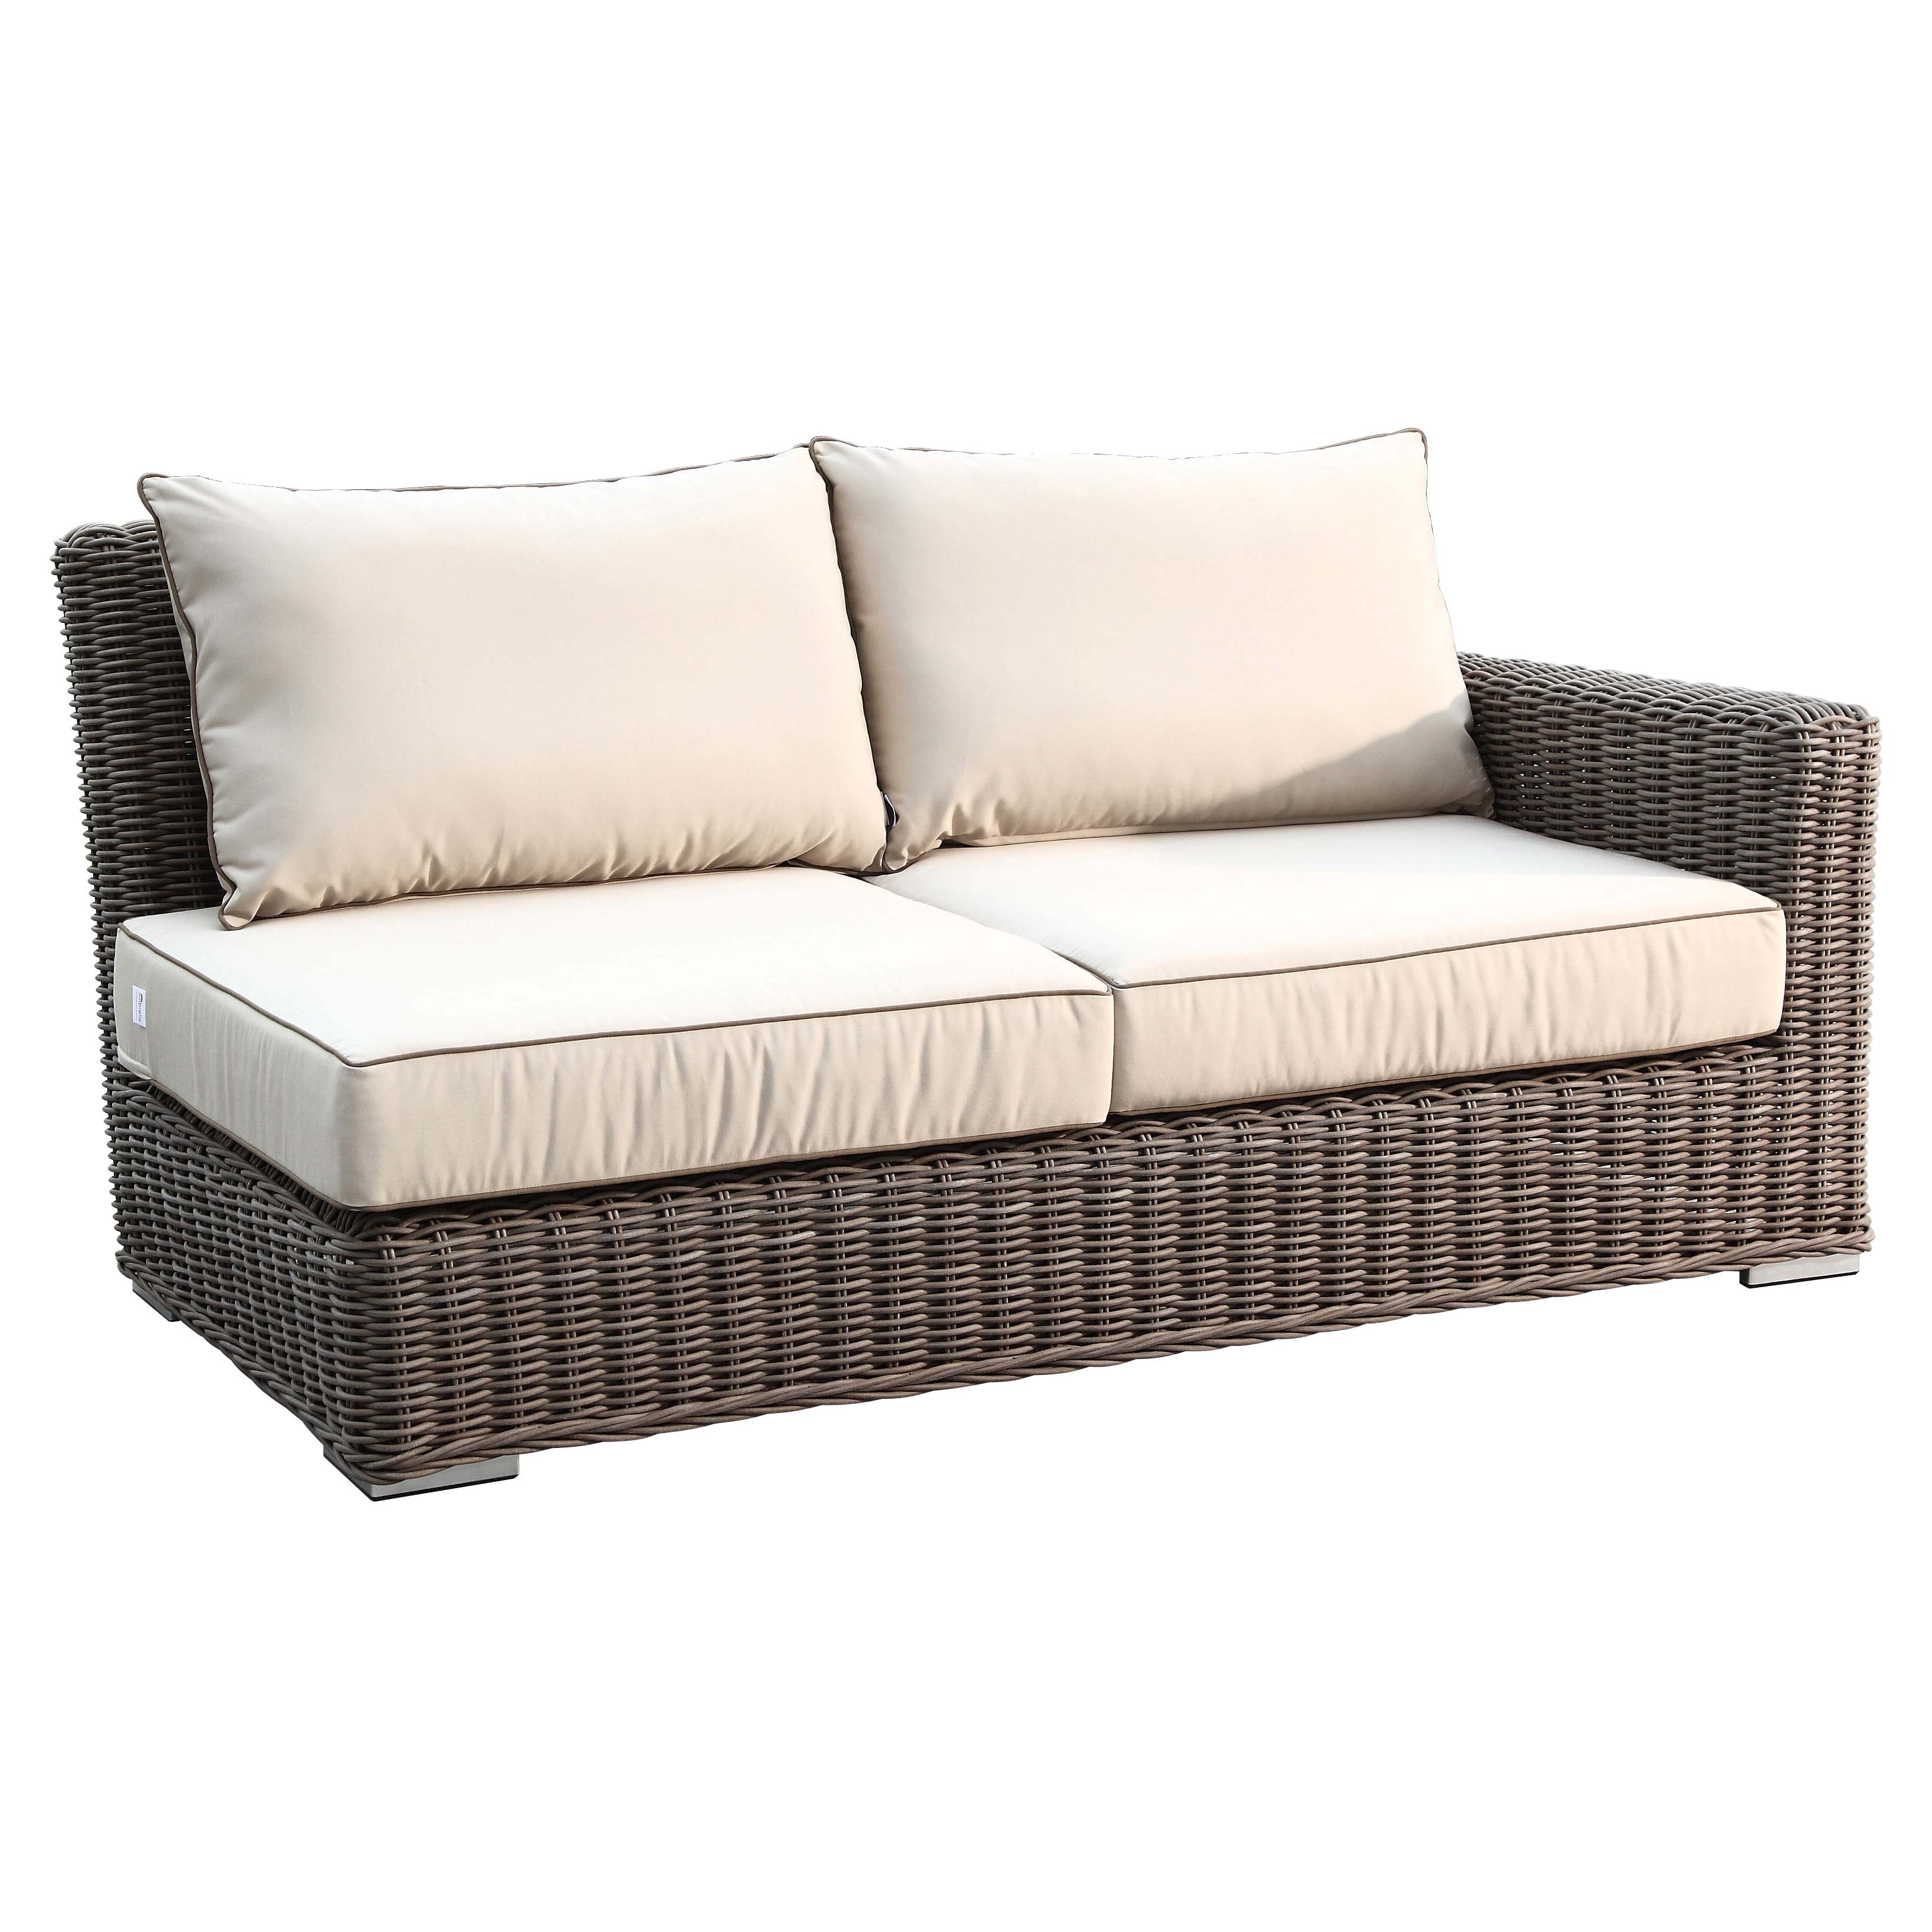 Sunset West Coronado 6 Piece Wicker Sectional Sofa Set